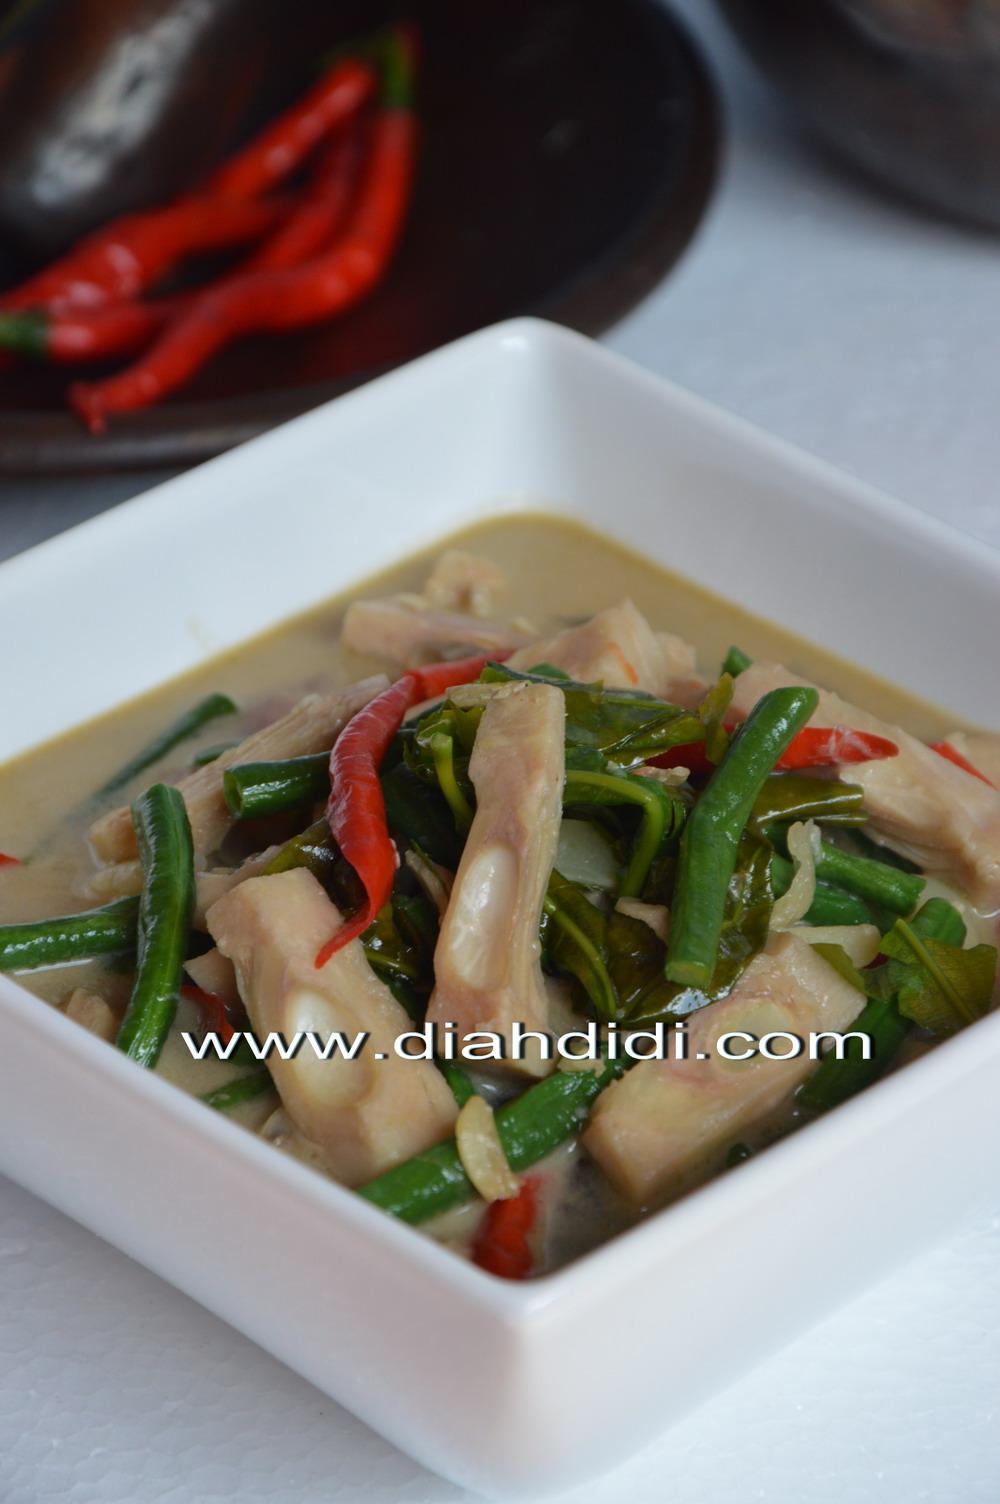 Resep Lodeh Tewel : resep, lodeh, tewel, Didi's, Kitchen:, *Jangan, Tewel*..^_^